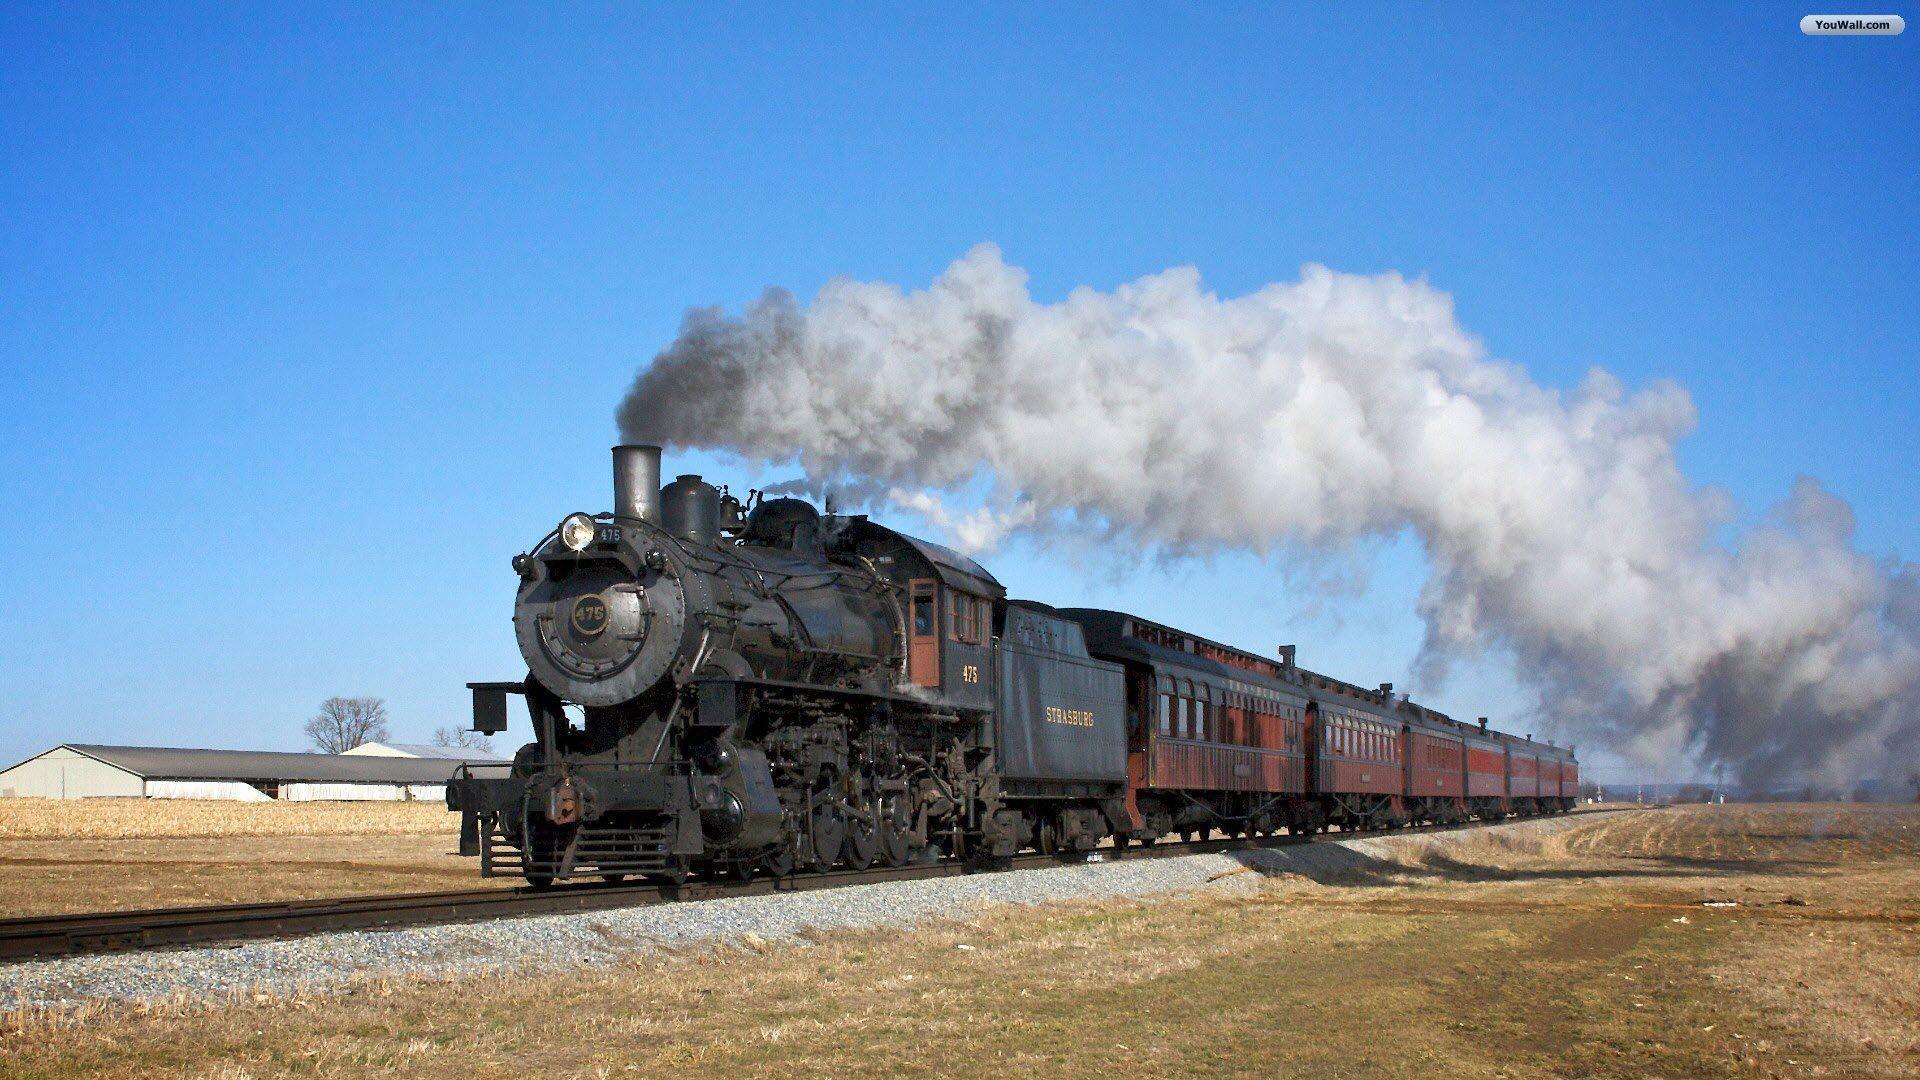 steam locomotive hd wallpapers - photo #20